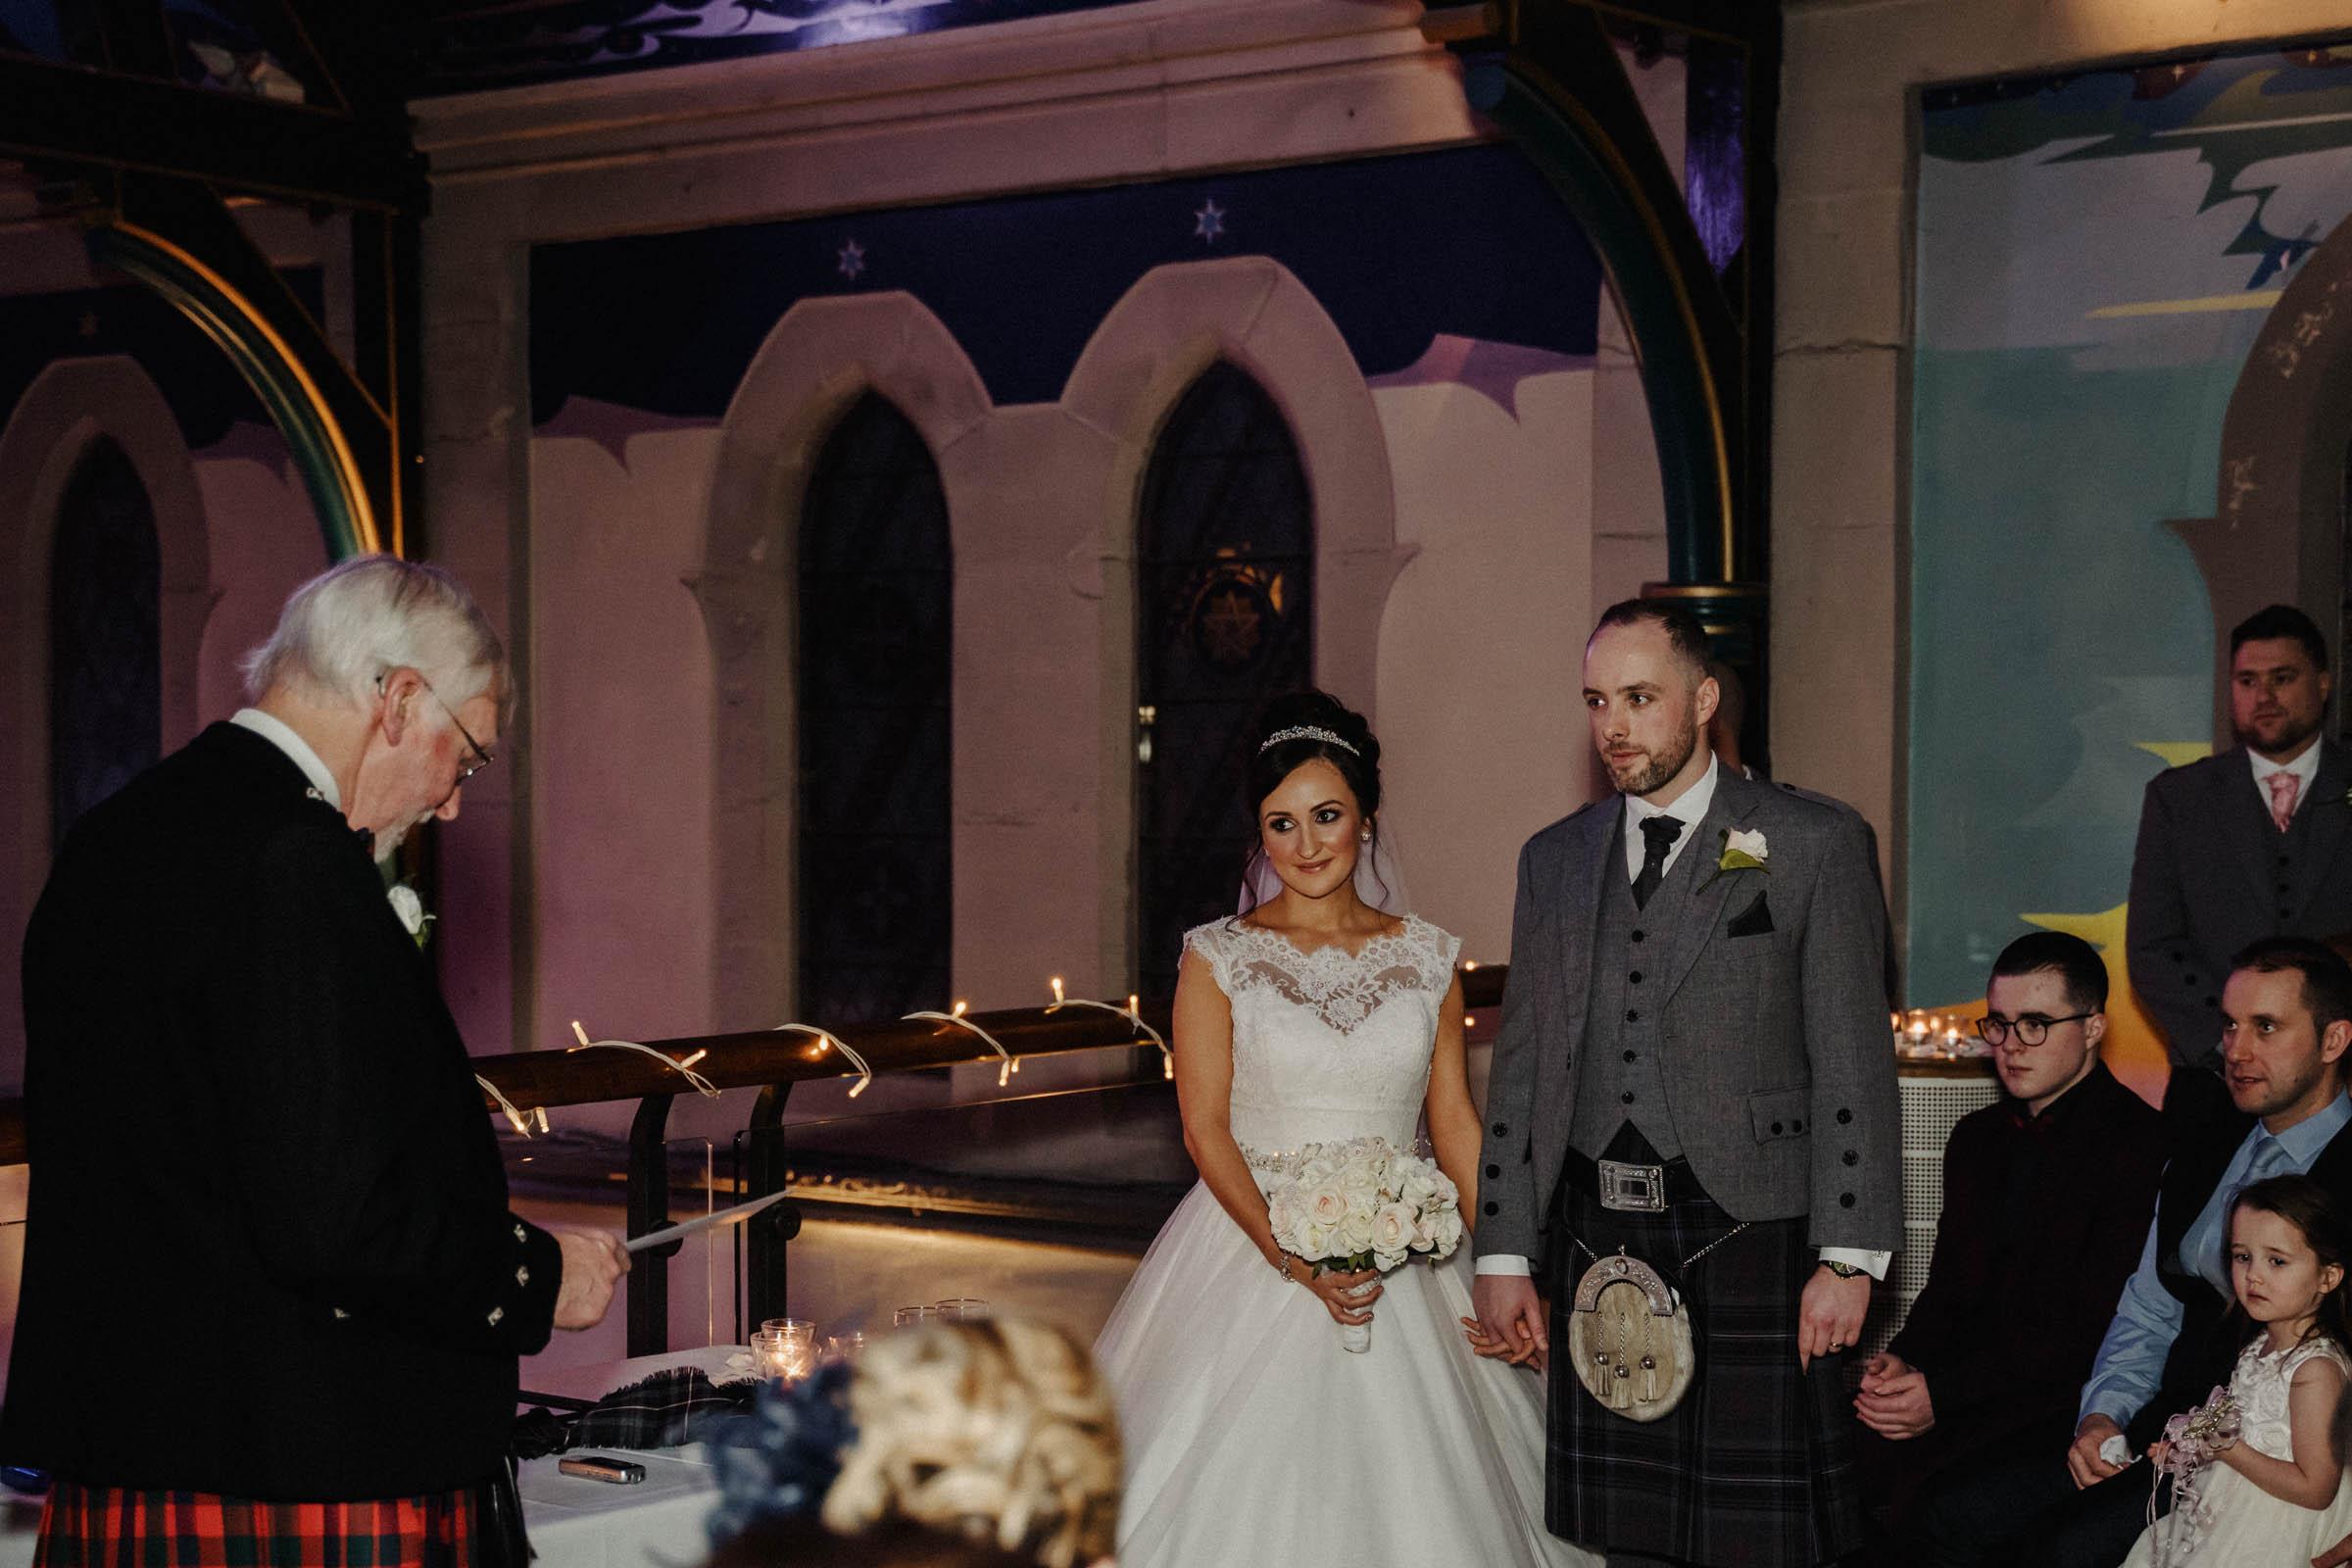 Oran-Mor-Wedding-Photographer-DearlyPhotography (21 of 55).jpg